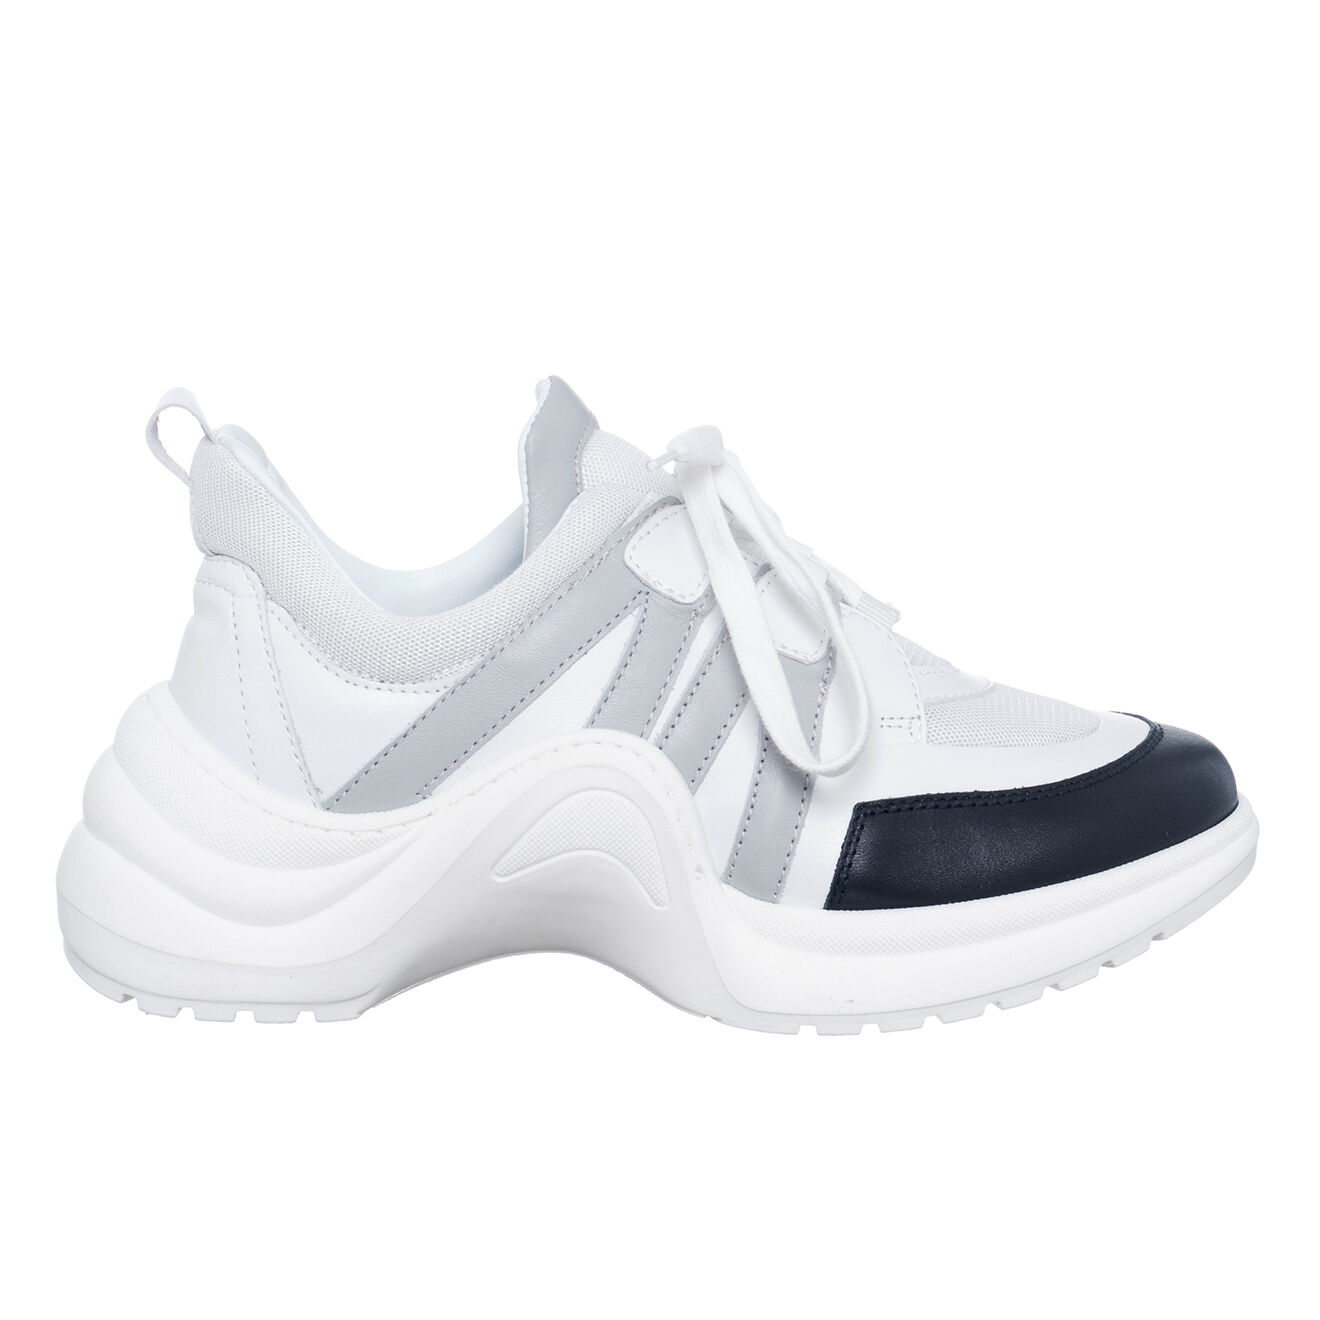 Sneakers en Cuir Bianca blanc/noir - Talon 5 cm - Loretta Pettinari - Modalova